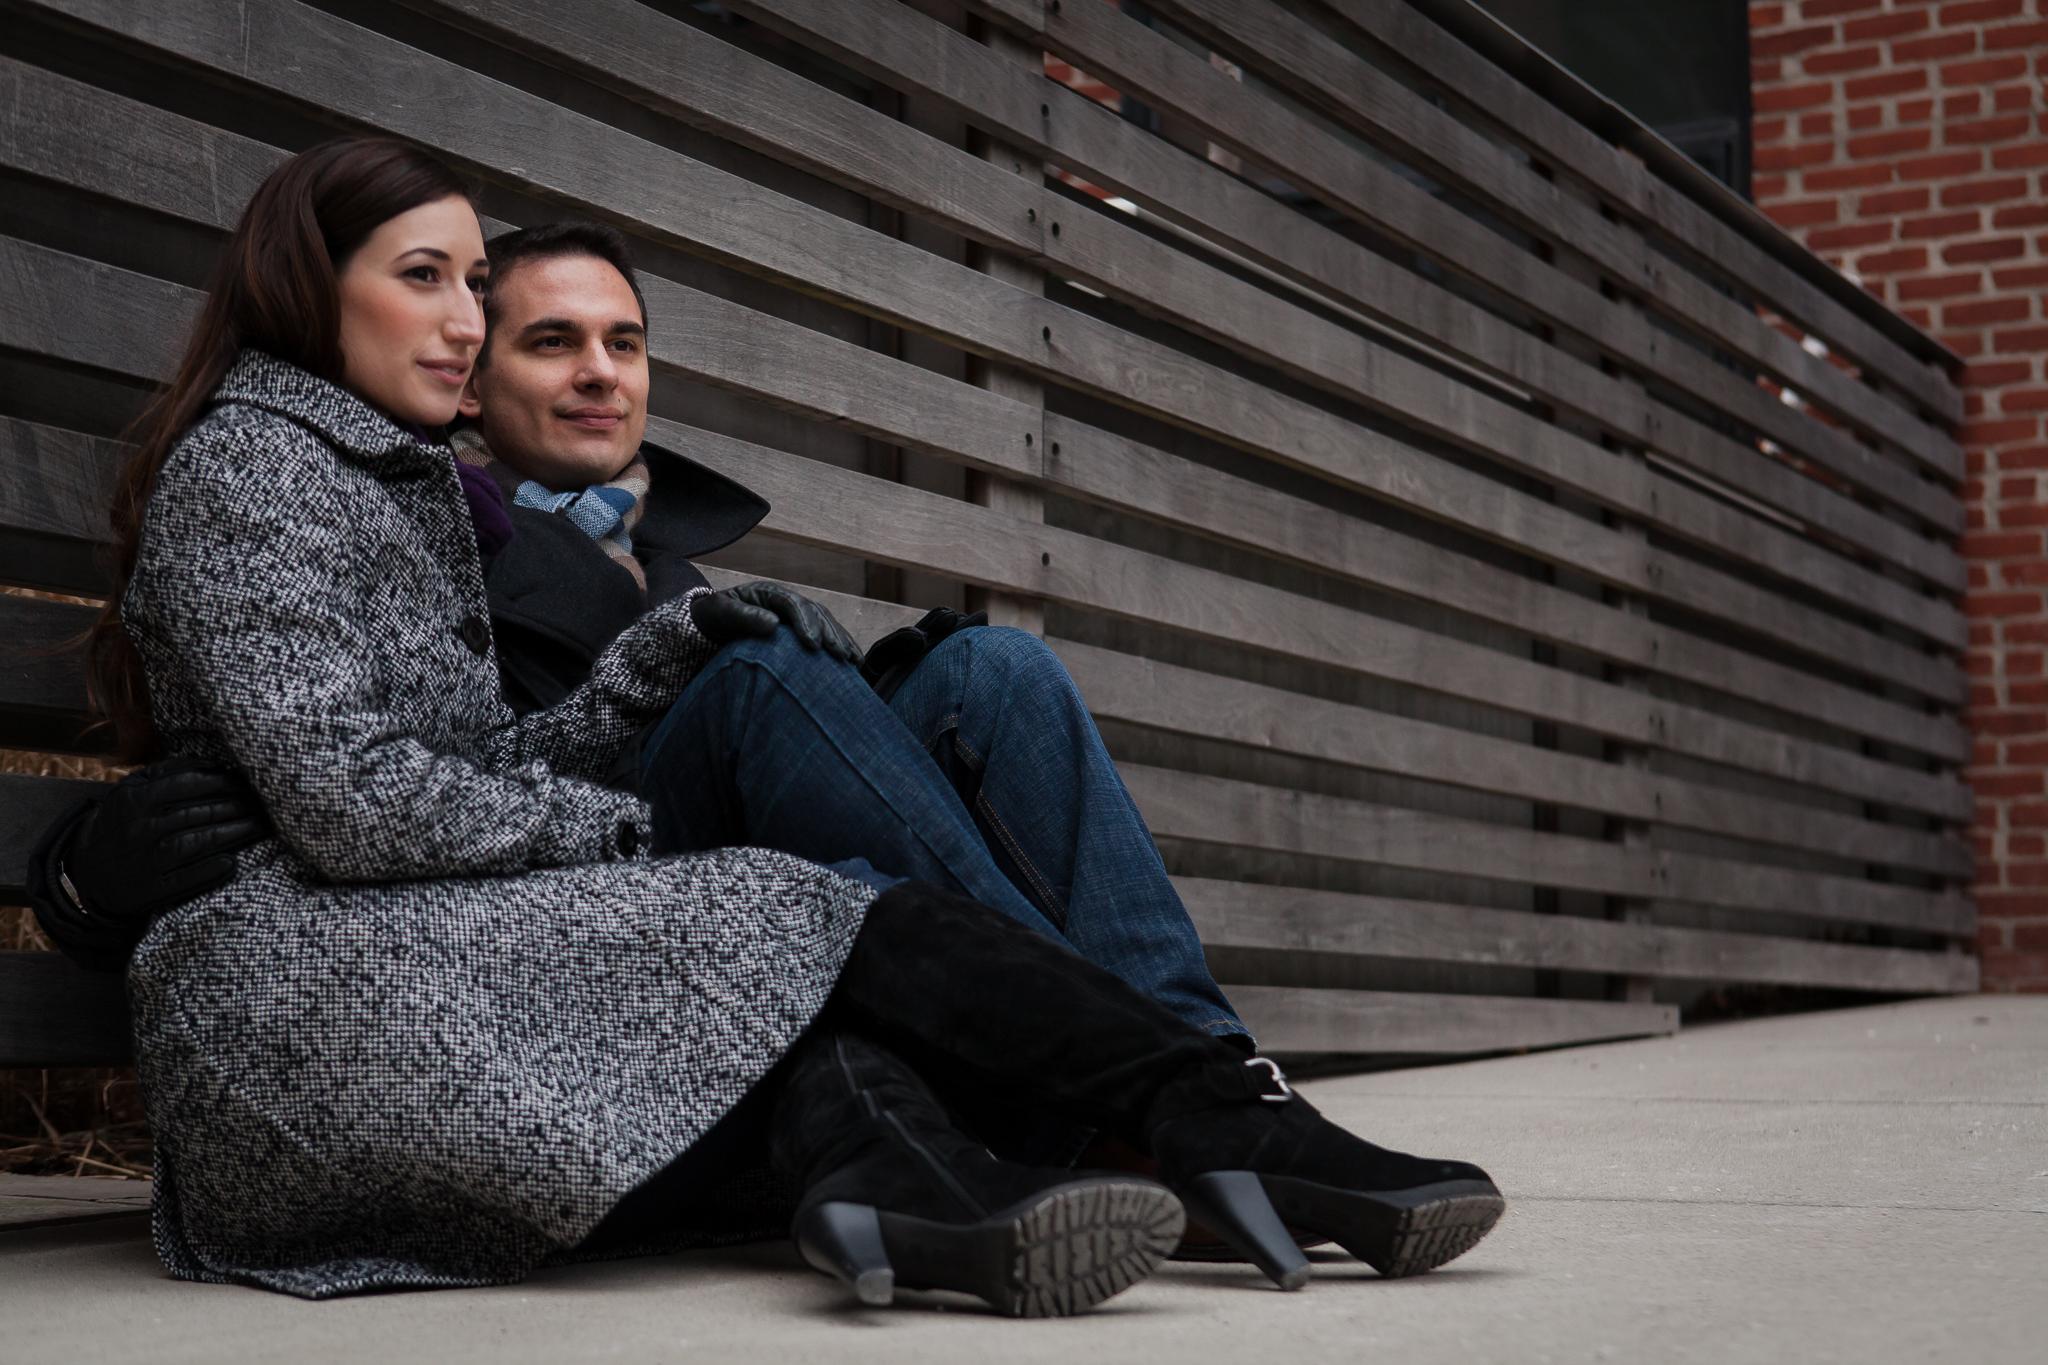 Toronto Wedding Photography - Kristina & Gabe Esession-24.jpg